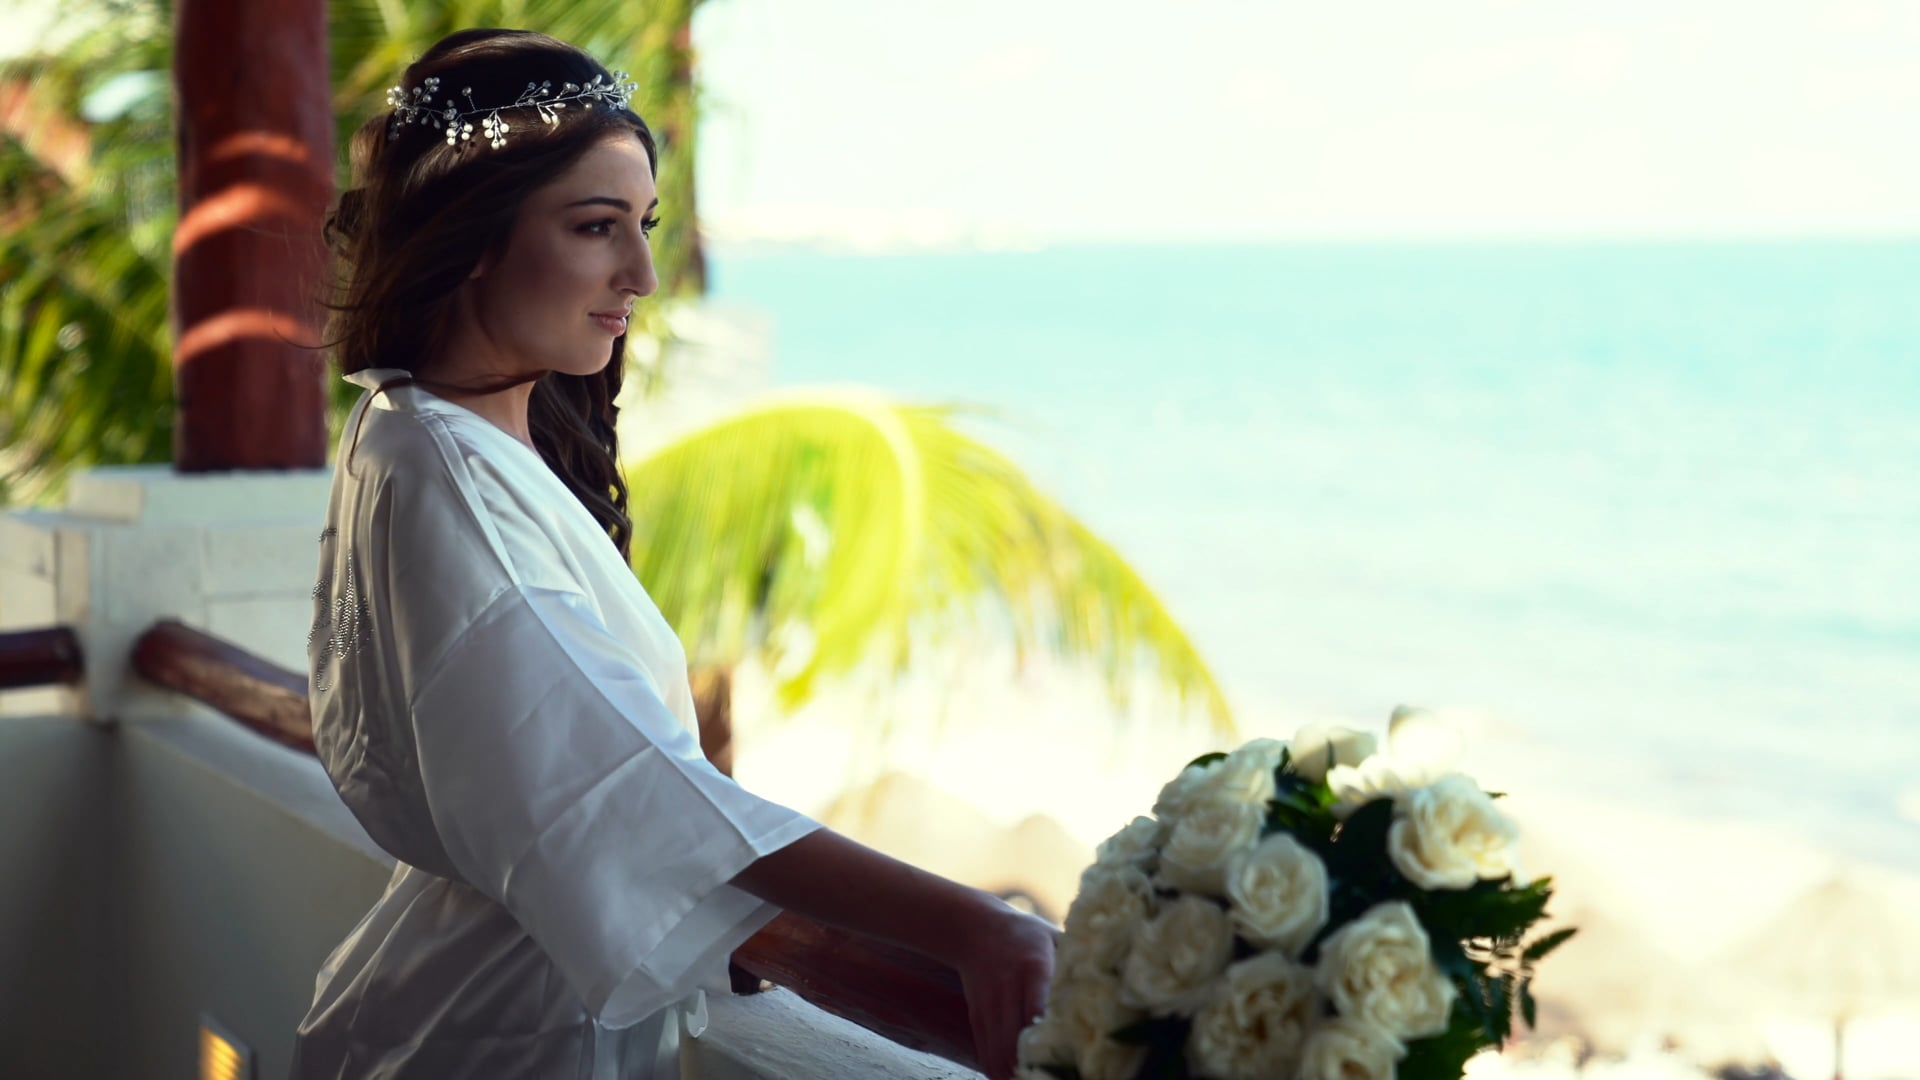 Nikki & Marcin, Now Saphire, Riviera Cancun, Mexico